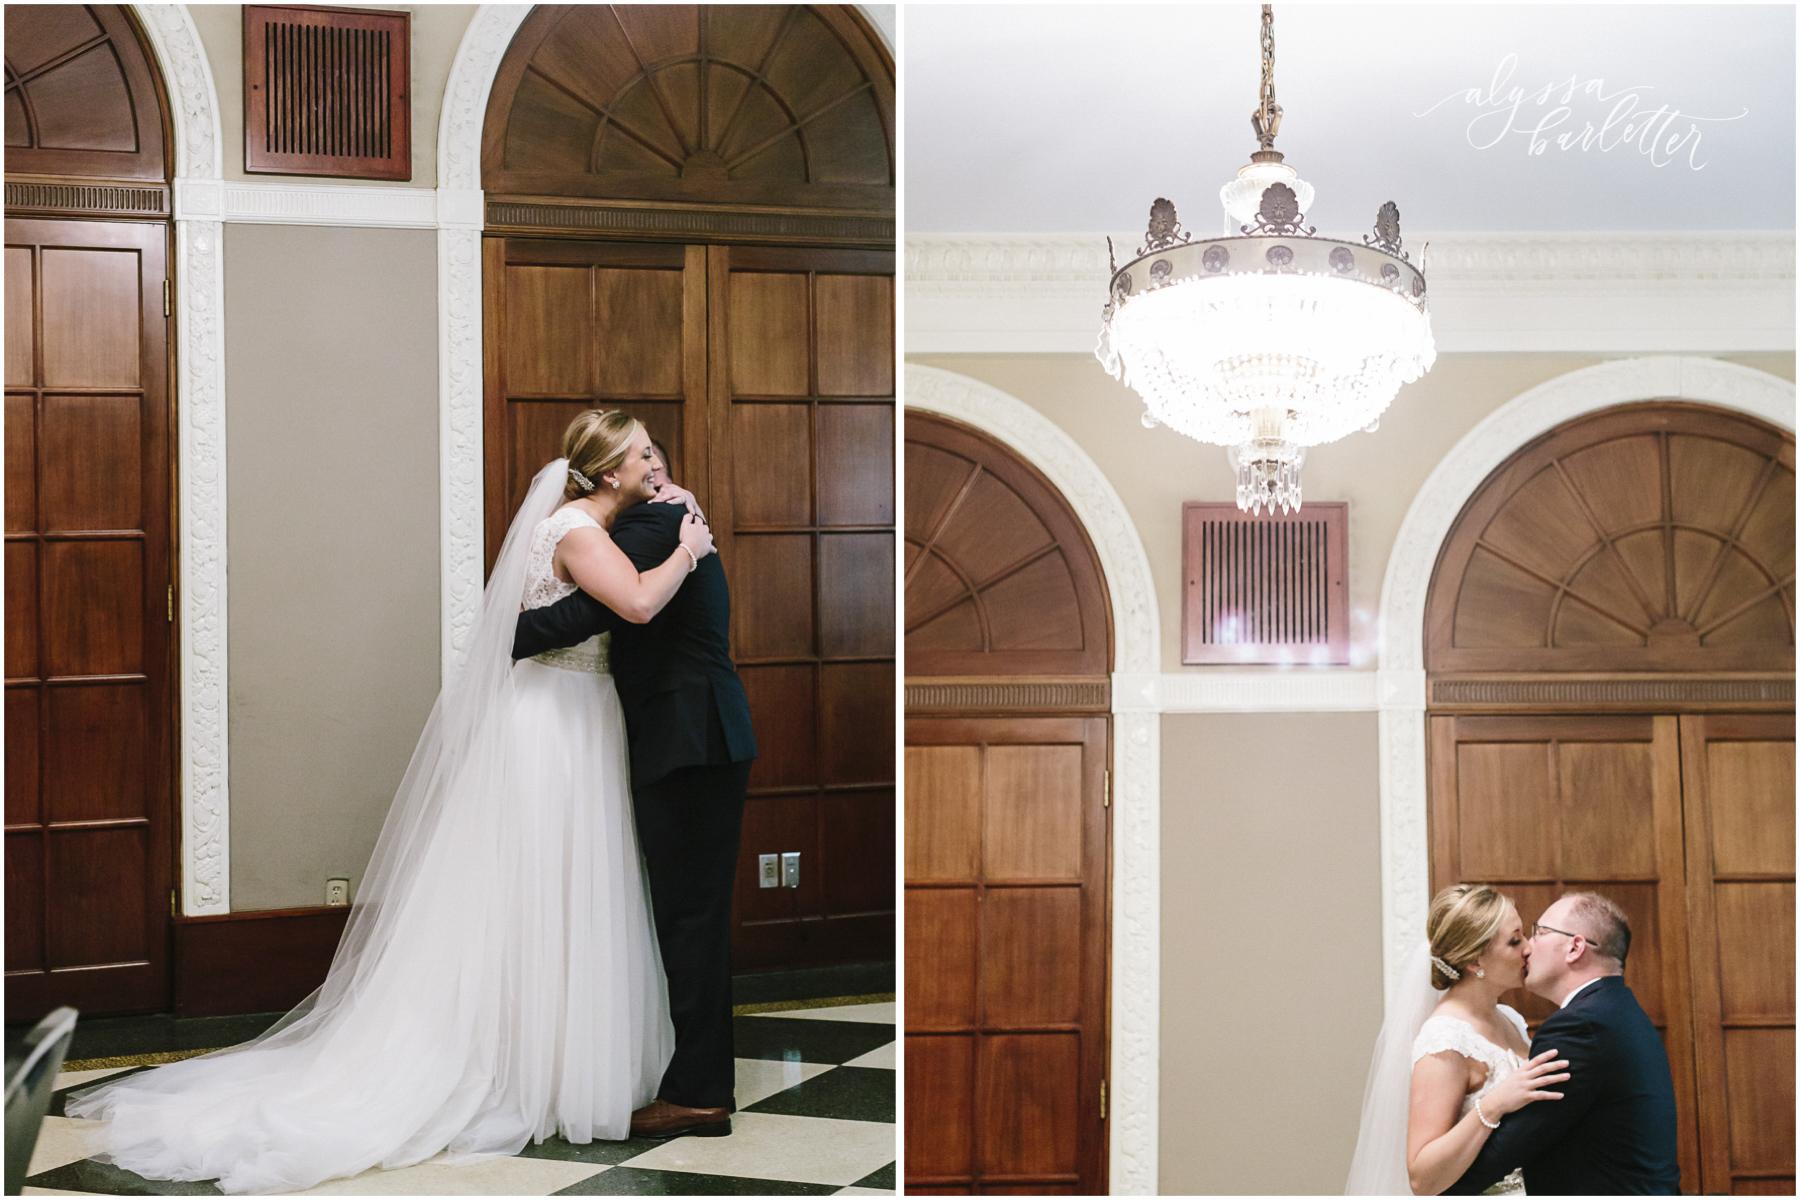 alyssa barletter photography cider gallery lawrence kansas rainy day wedding megan and brett-1-14.jpg